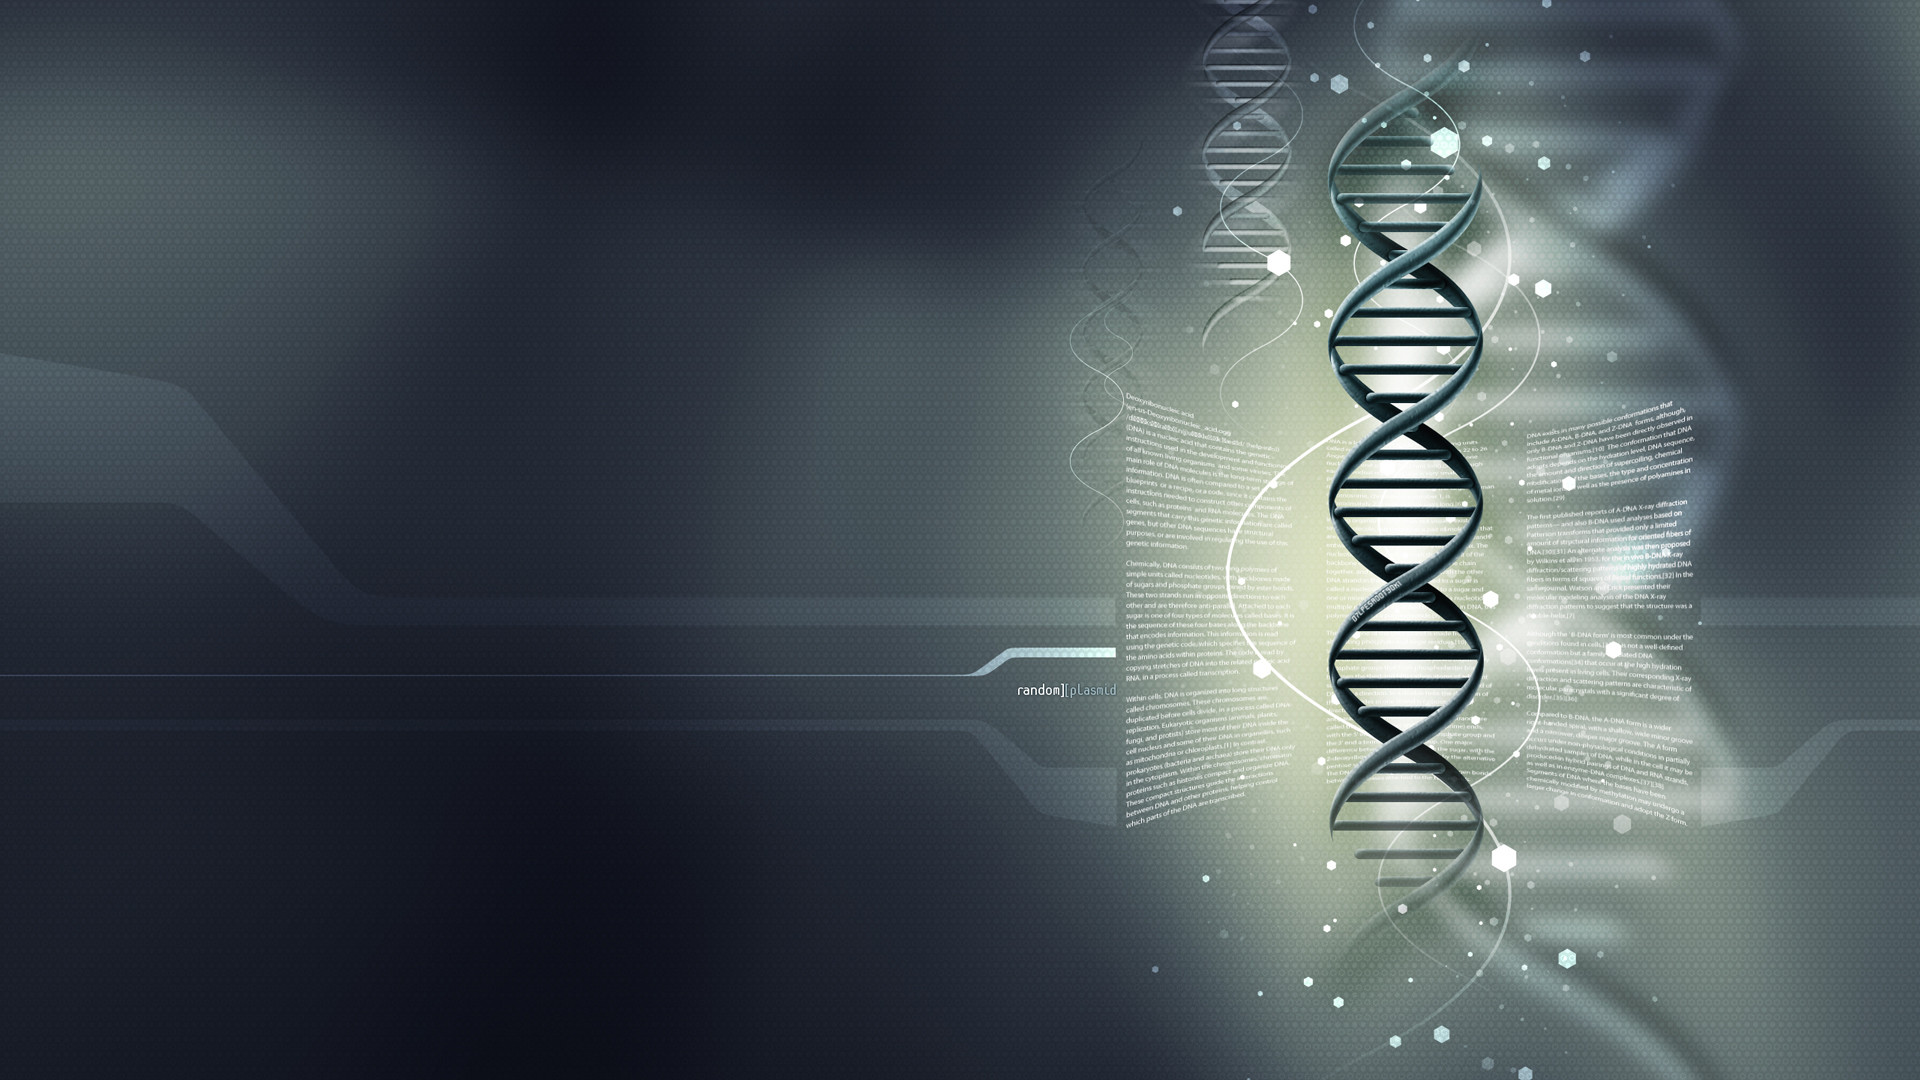 Download Science Dna Wallcg Wallpaper | Full HD Wallpapers